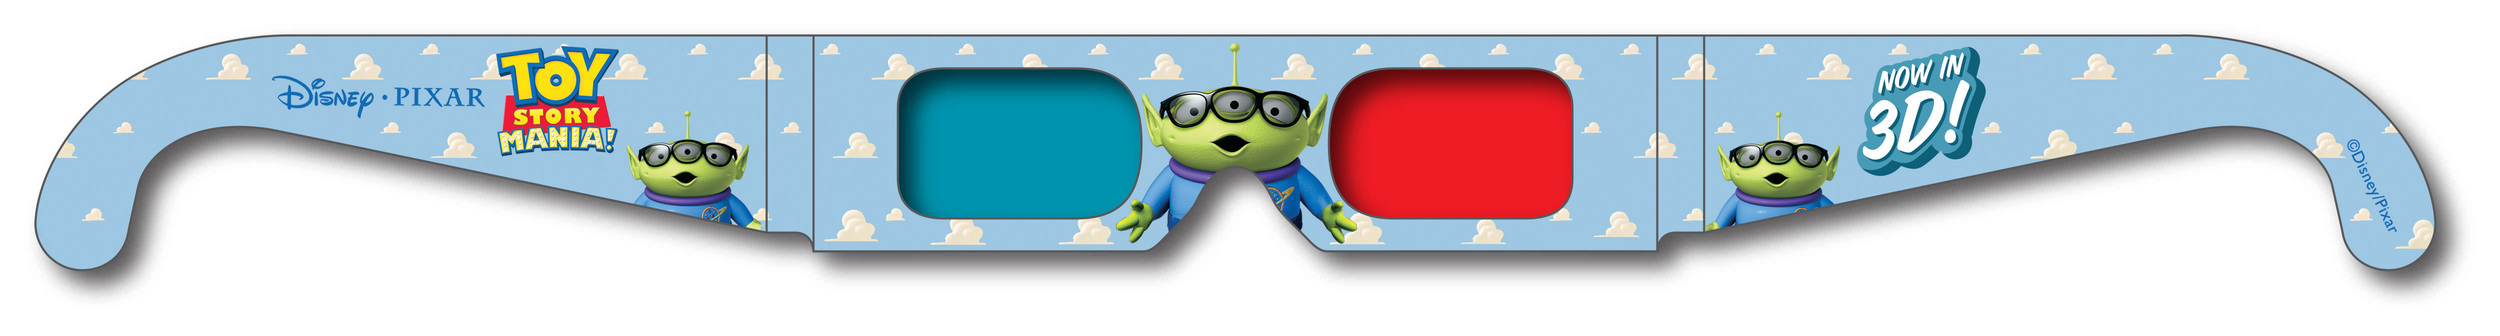 Disney_Toy_Story_Anaglyph_3D_Glasses.jpg